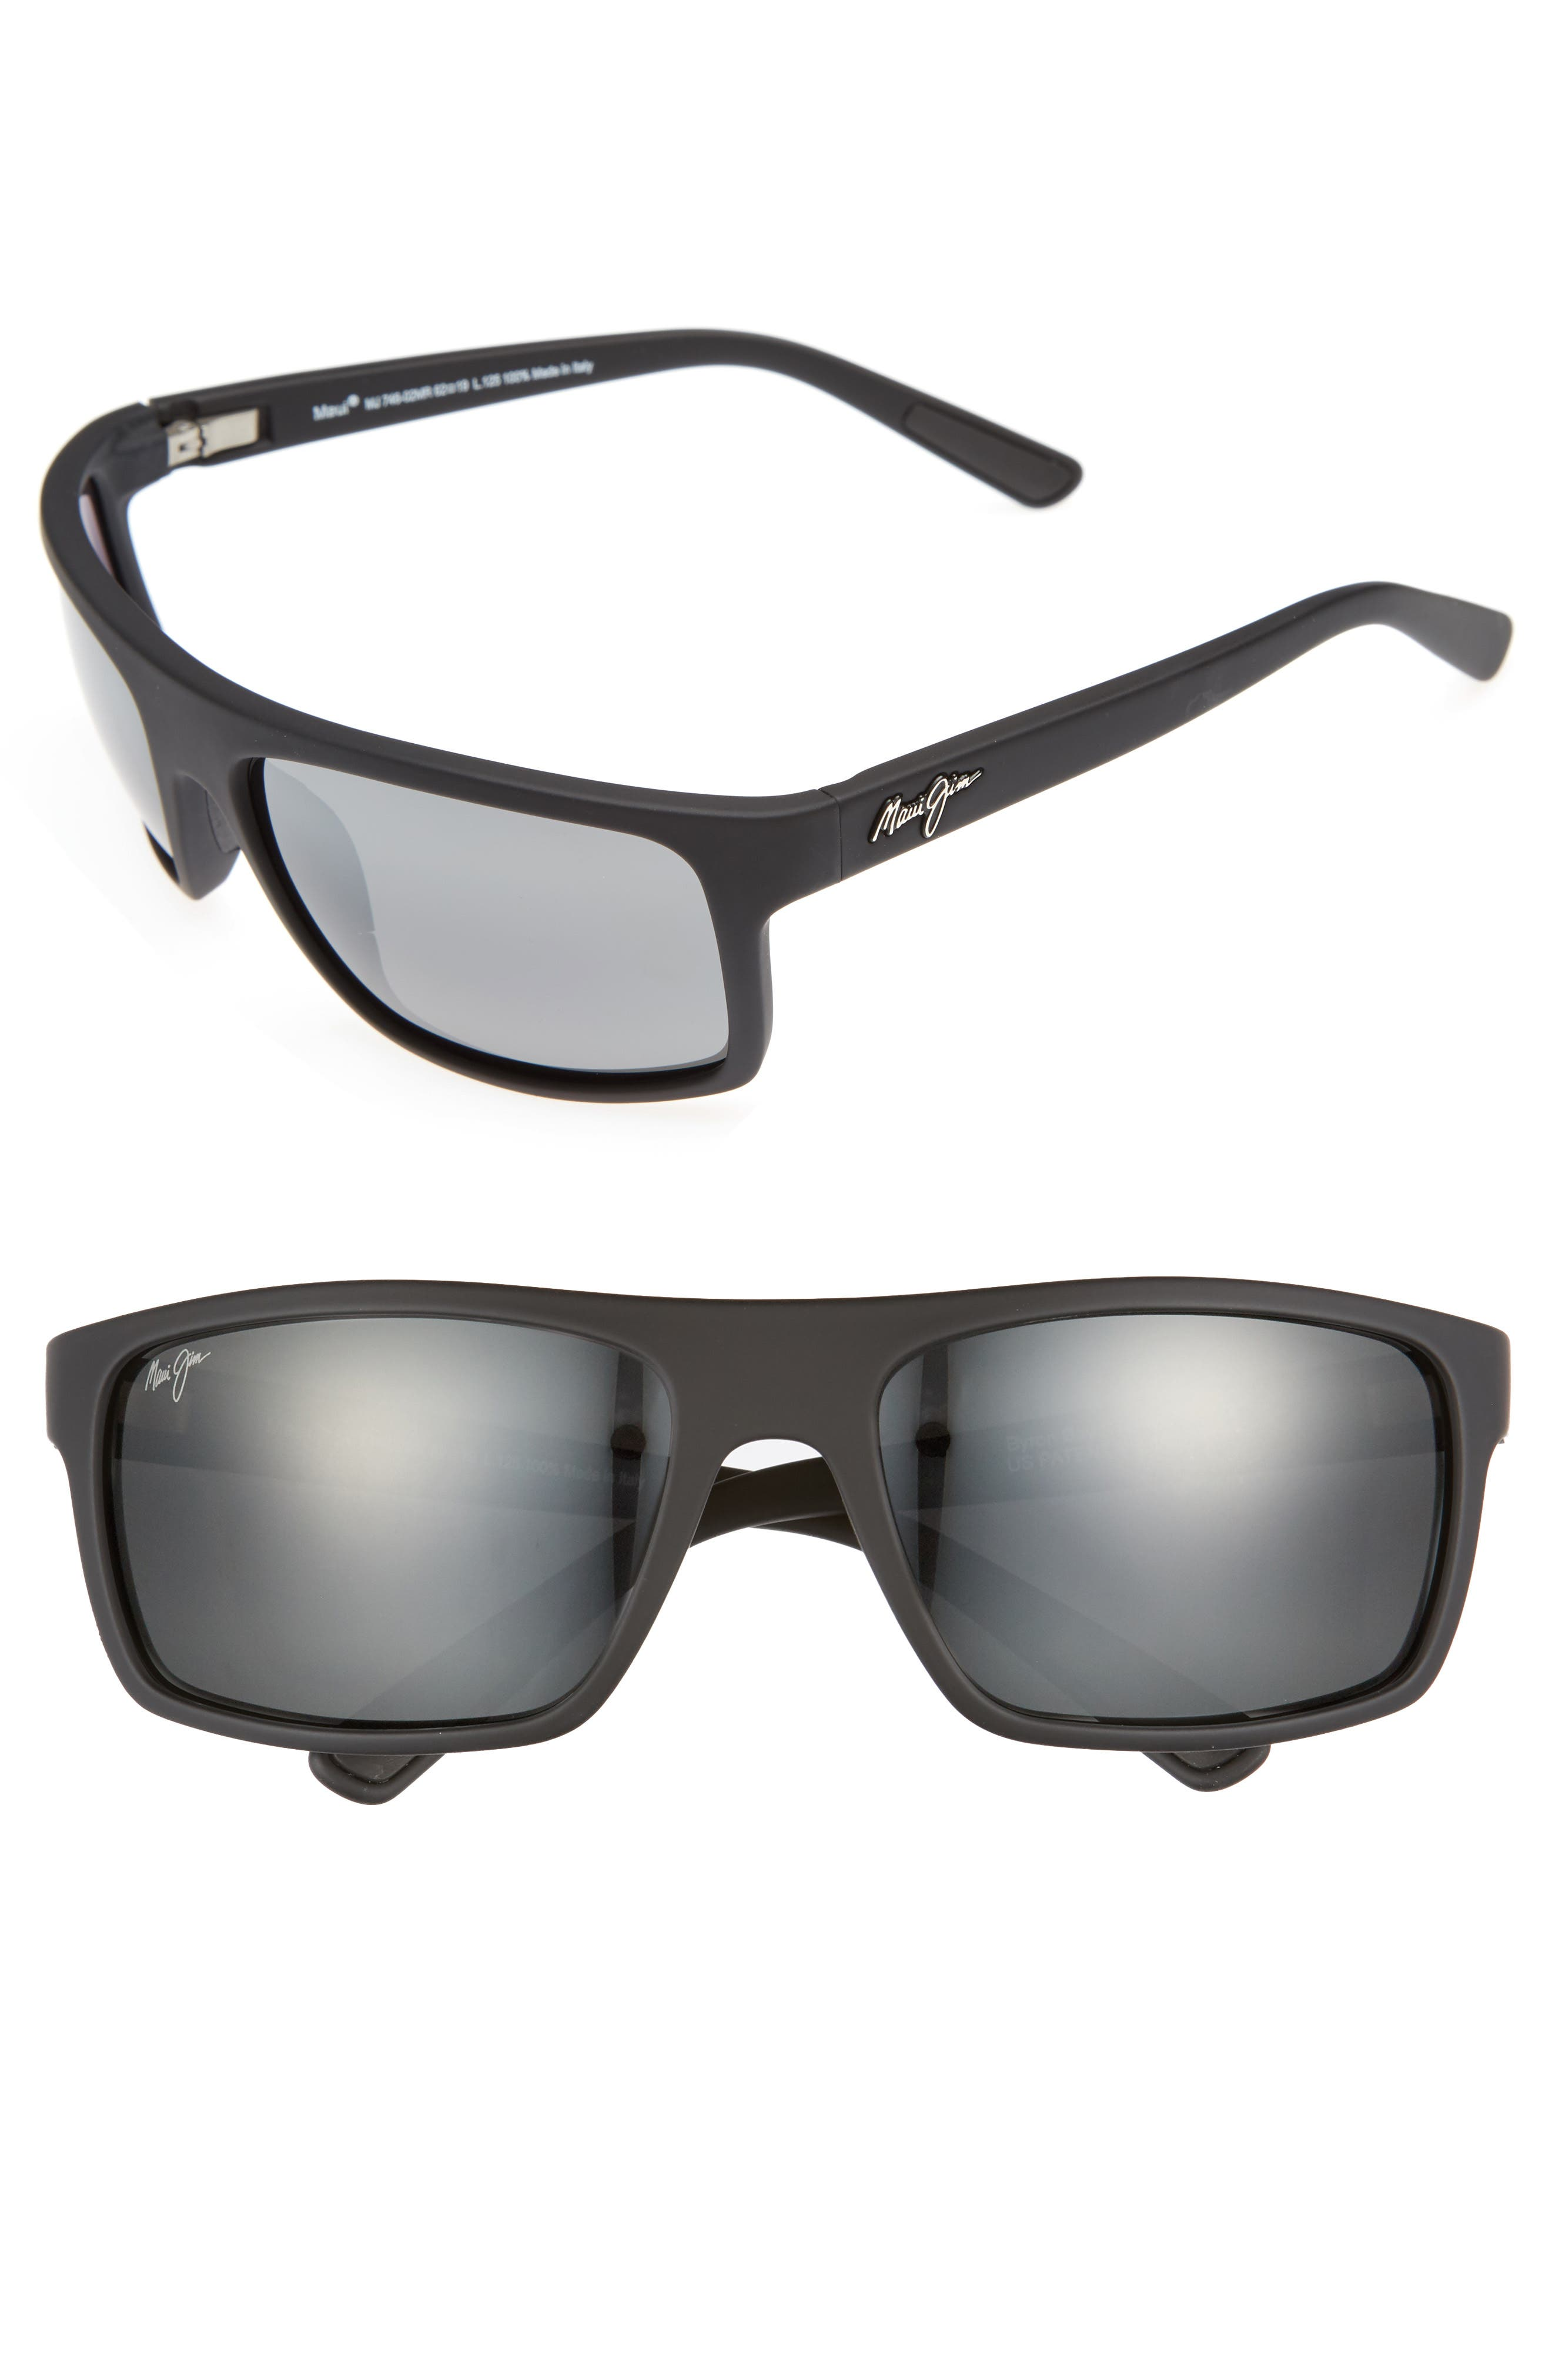 Maui Jim Byron Bay 62Mm Polarized Sunglasses - Matte Black/ Neutral Grey